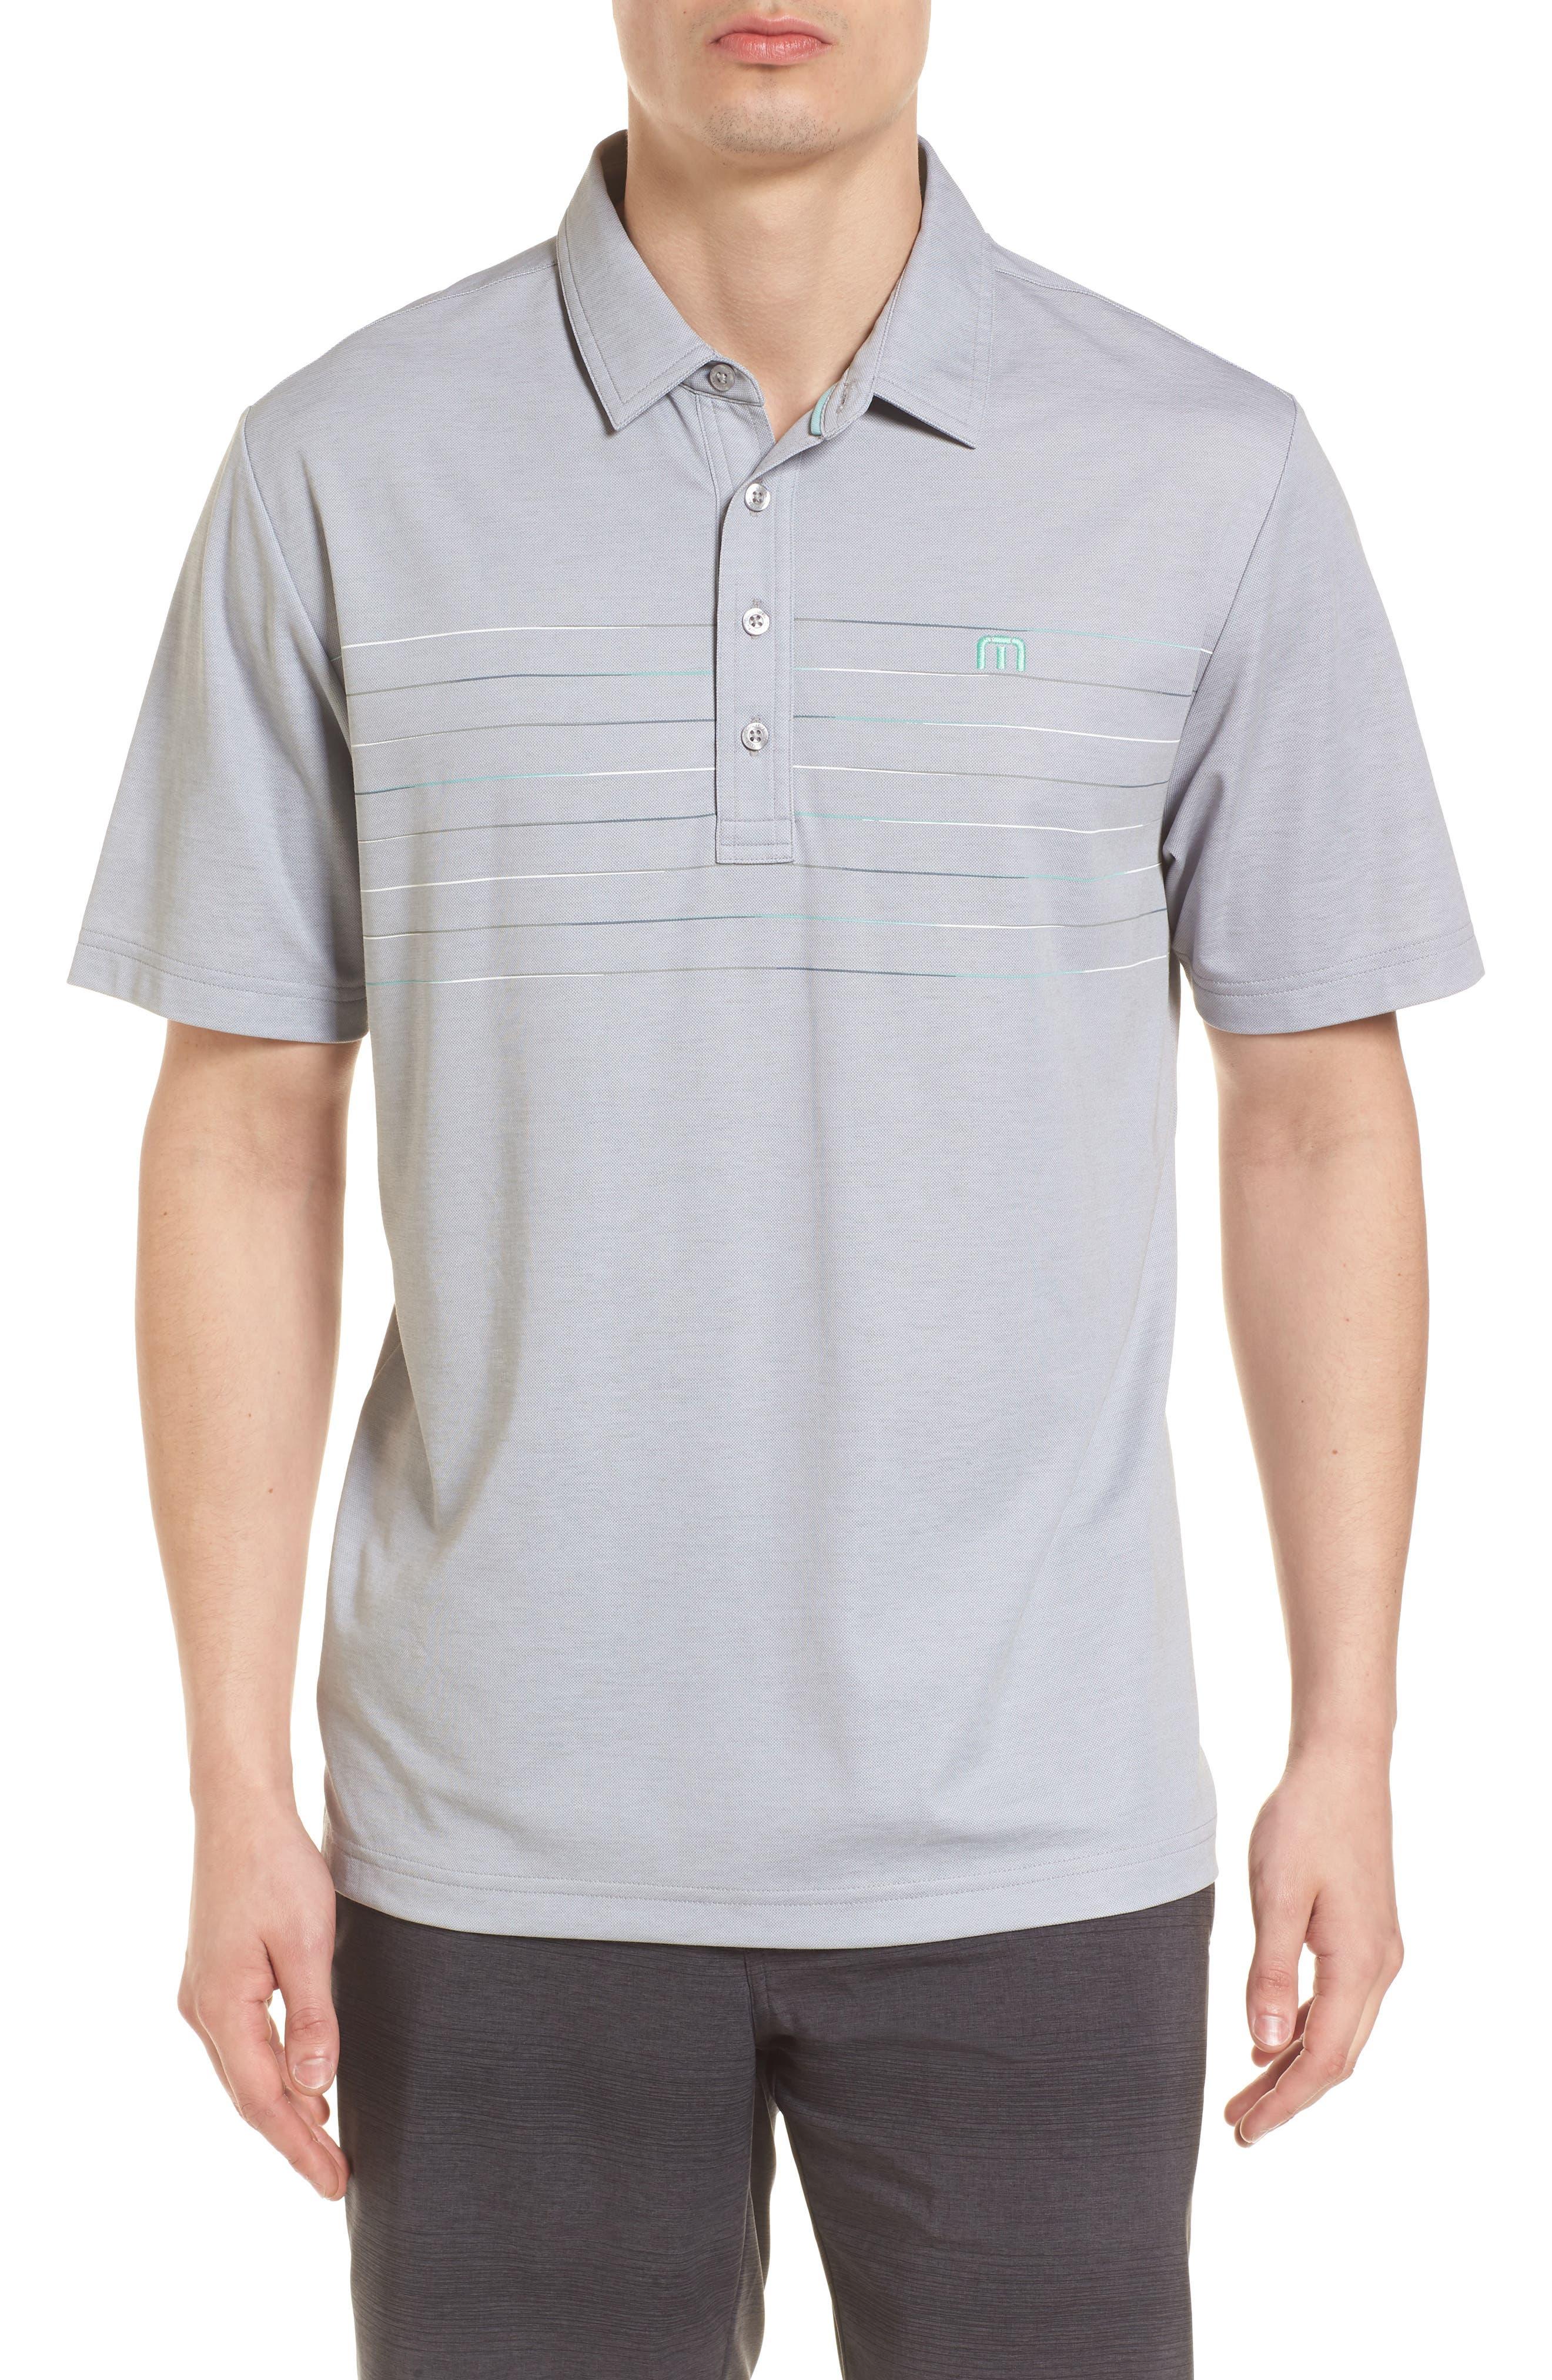 Good Good Polo Shirt,                             Main thumbnail 1, color,                             020